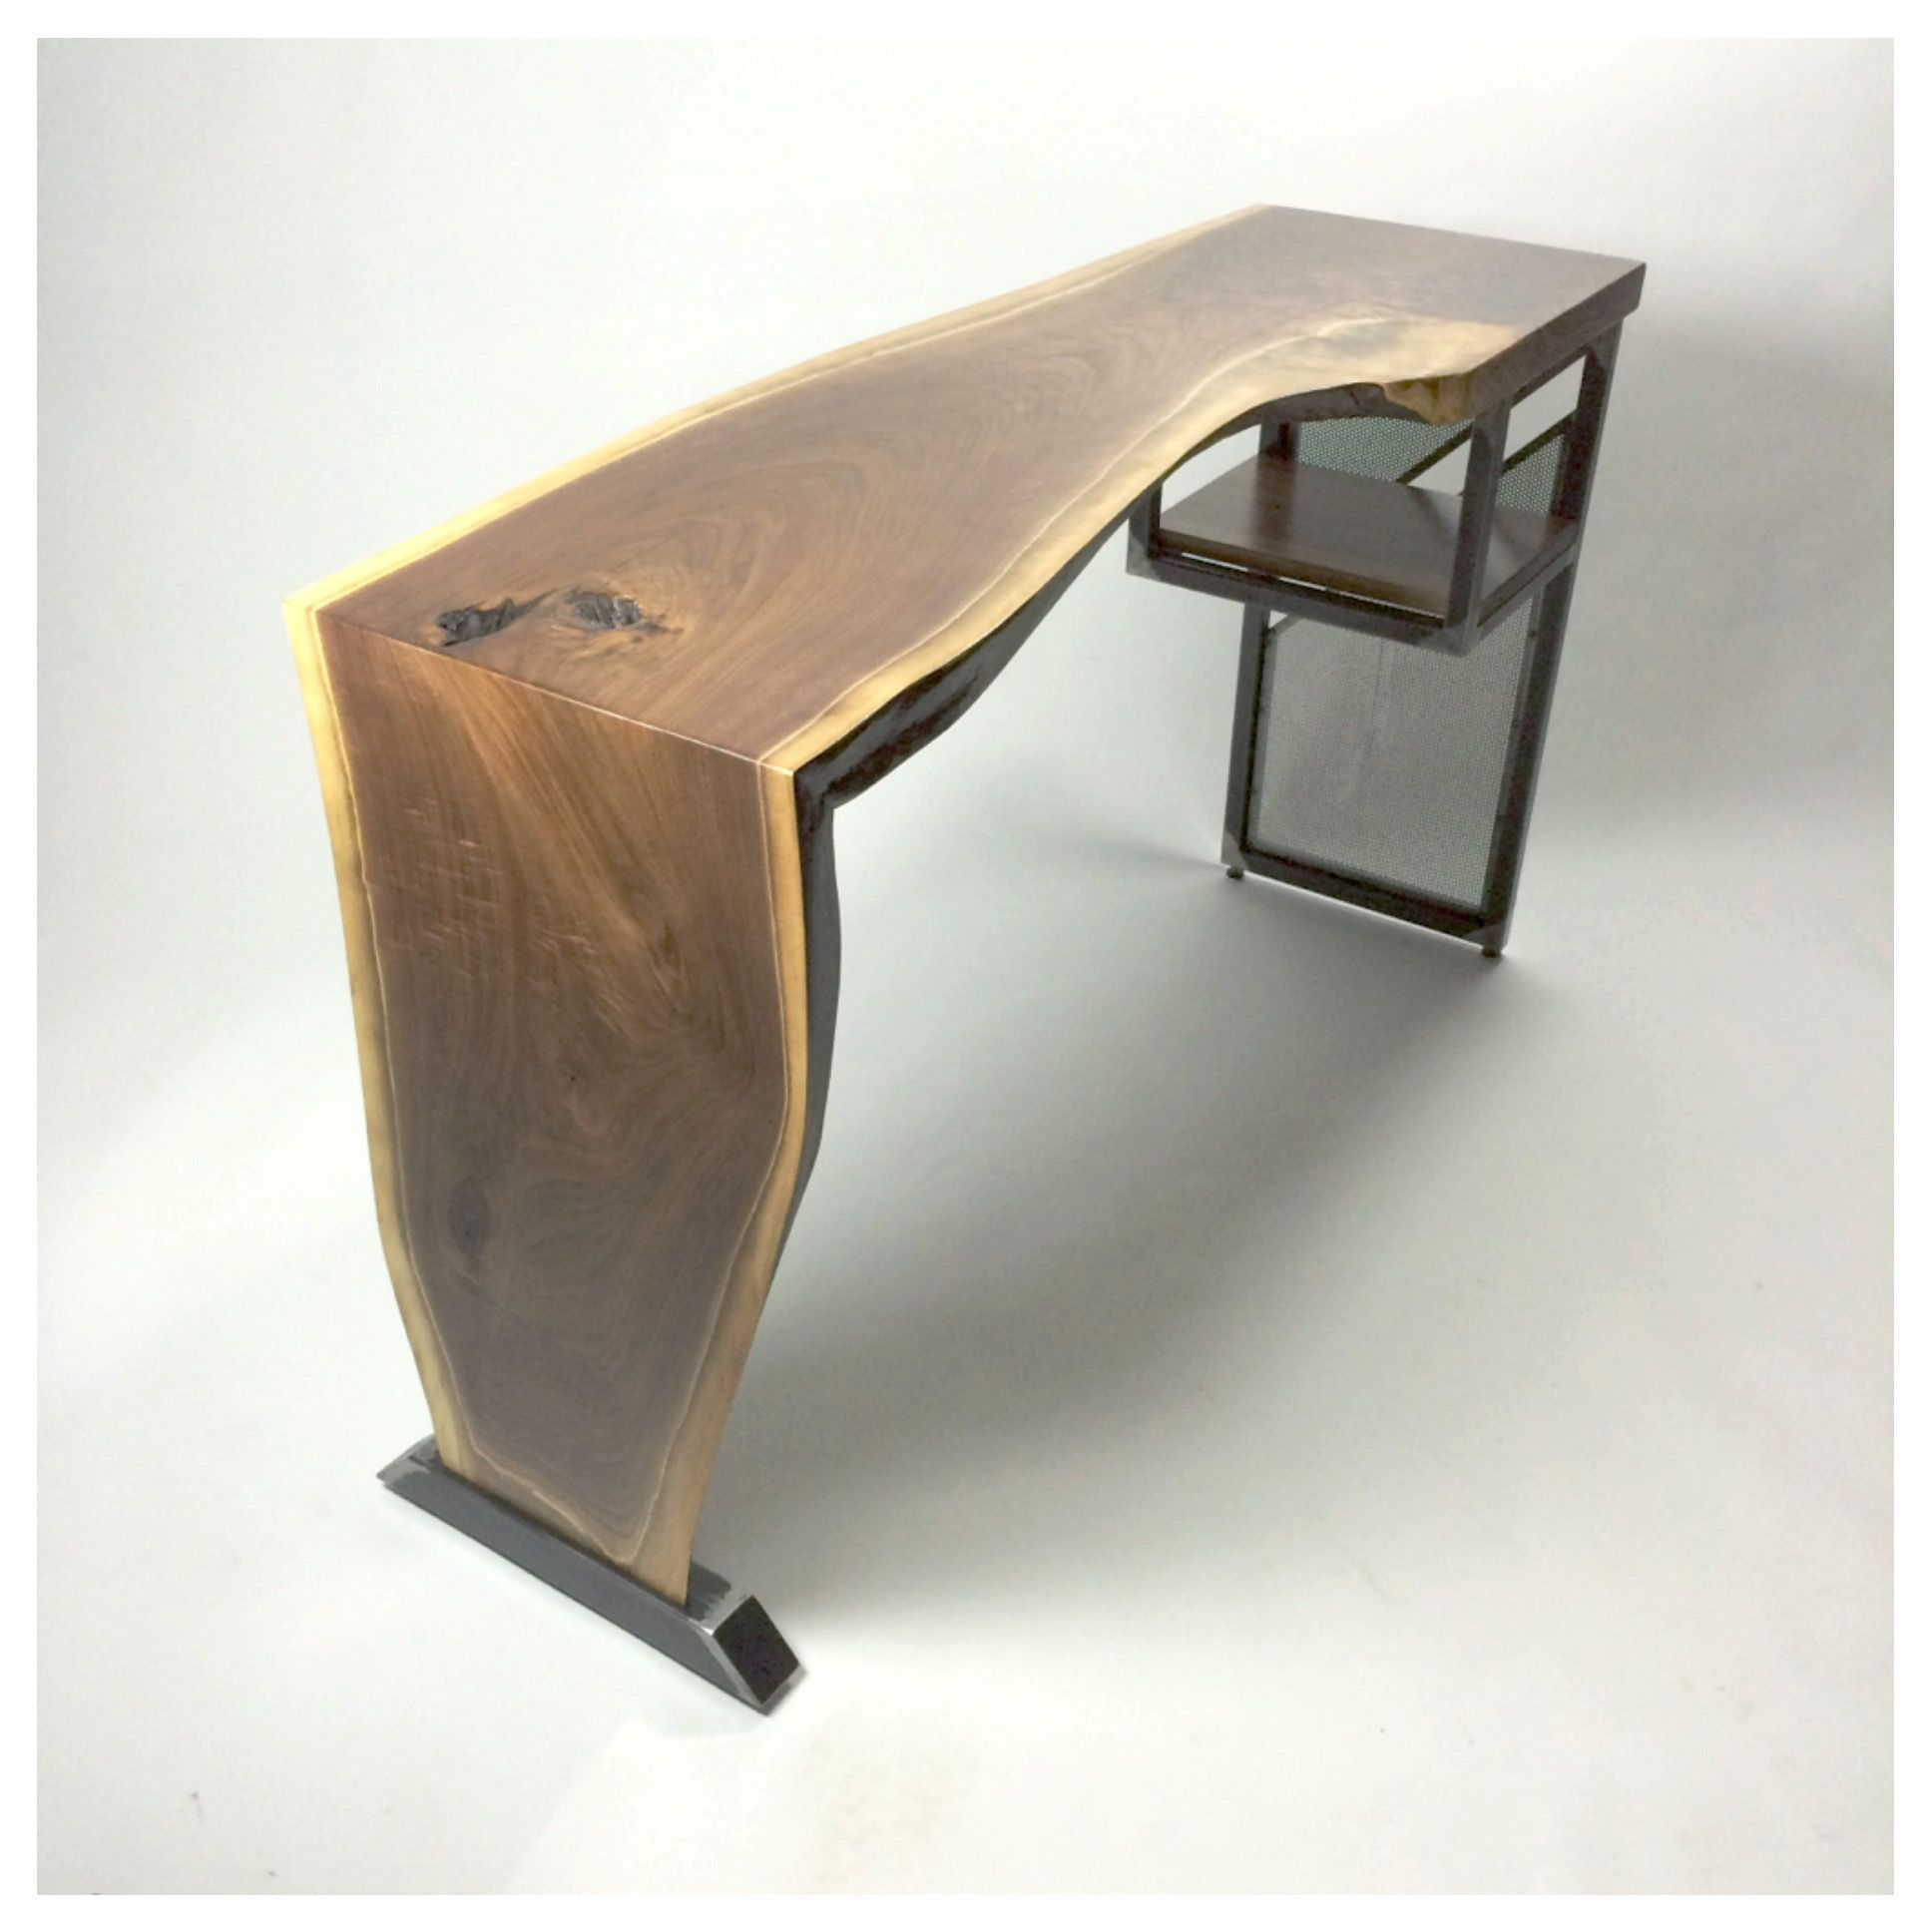 Industrial Unique Metal Designer Coffee Table: Custom Made Live Edge Waterfall Desk Modern Industrial